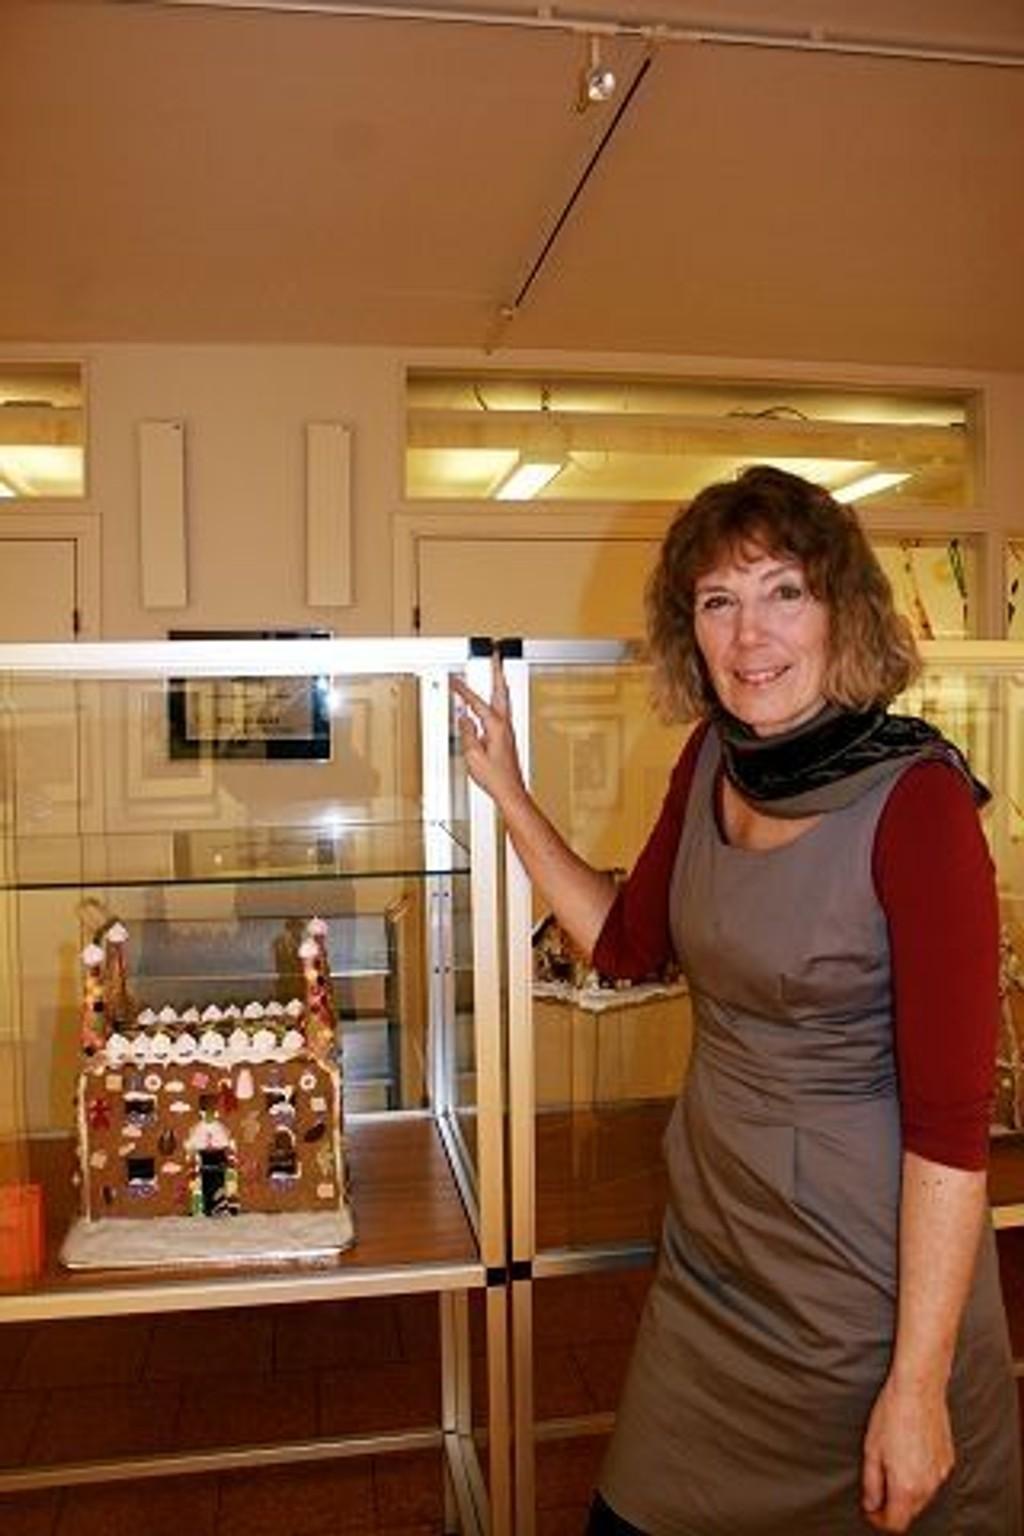 Bibliotekar Elisabeth Svånå har dratt i gang pepperkakehusutstilling på biblioteket på Stovner.